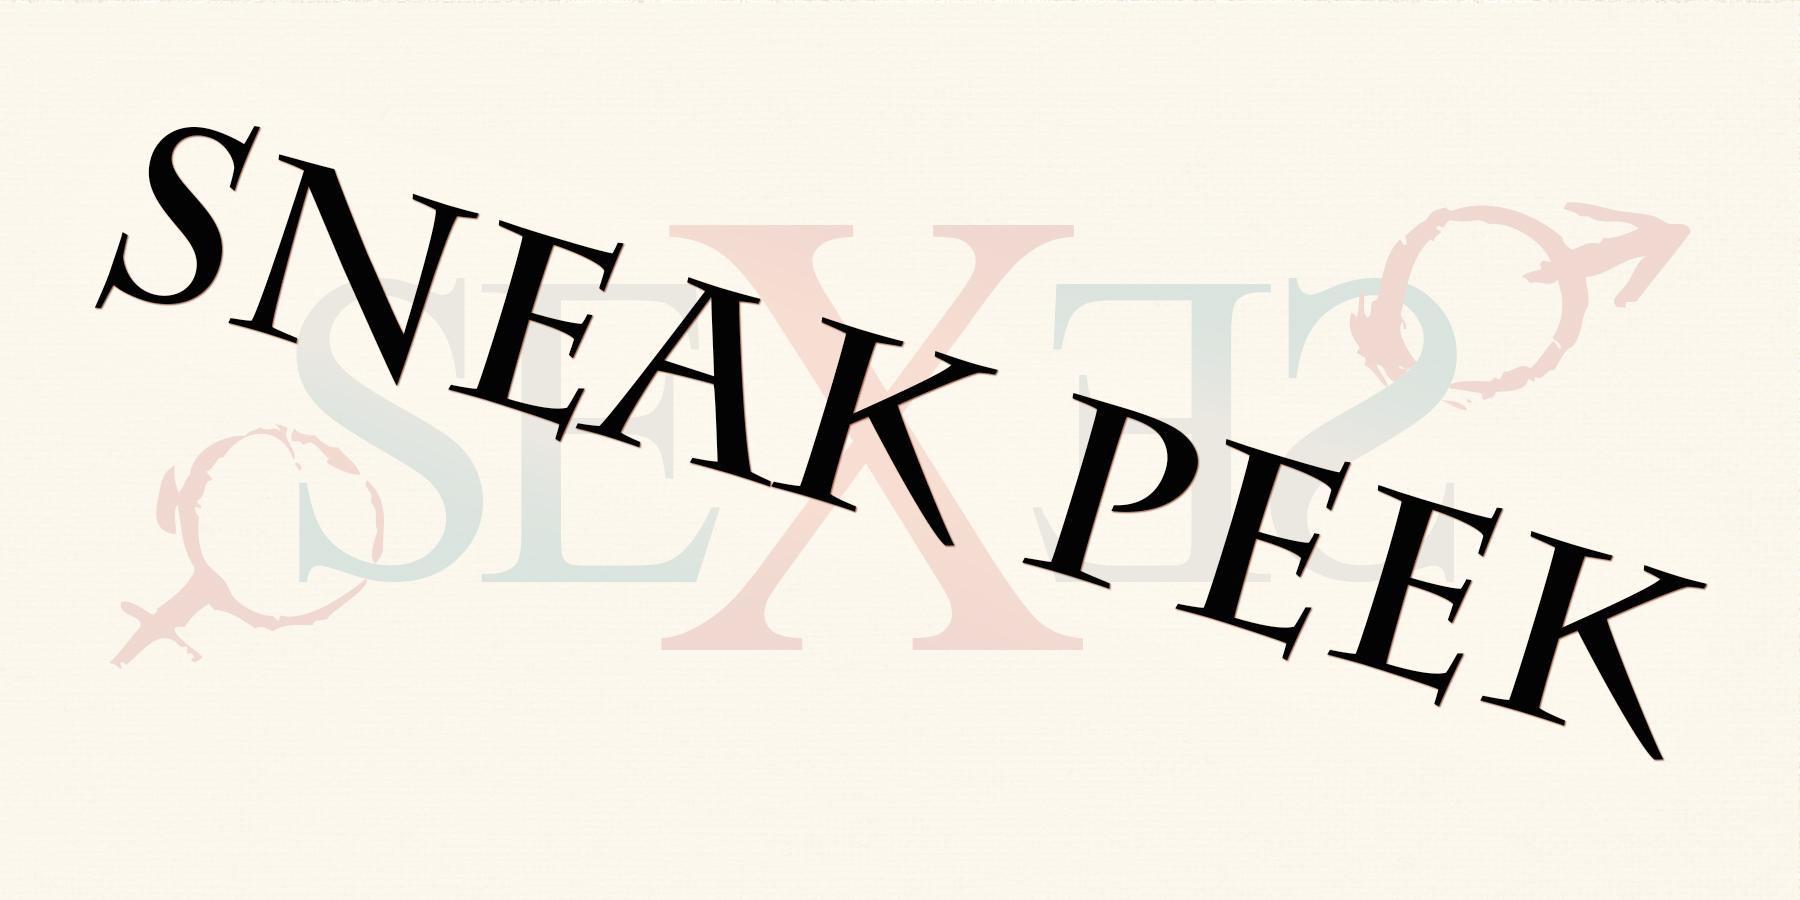 Sexes Sneak Peek